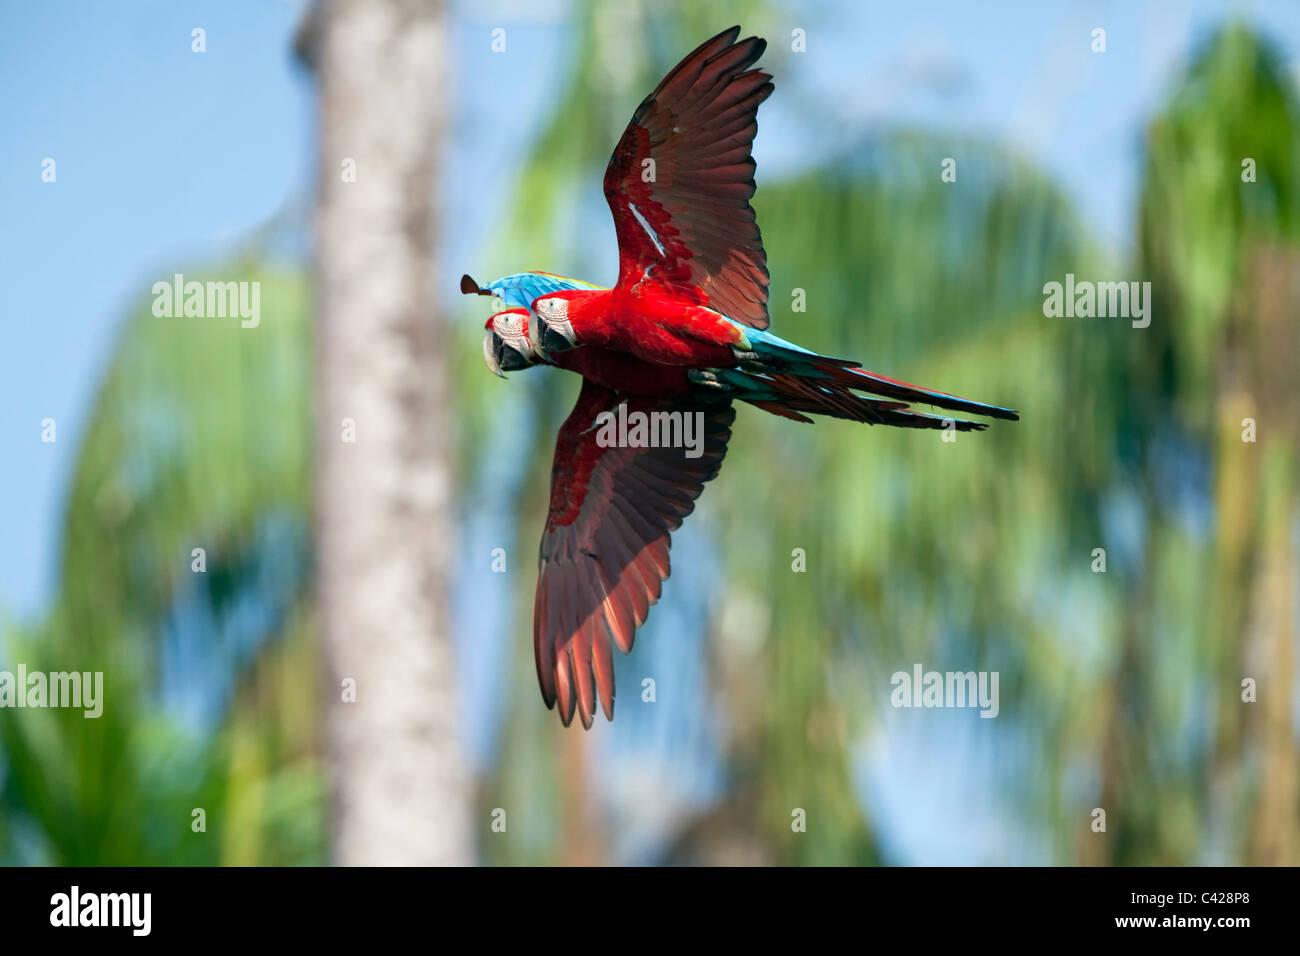 Manu National Park, Red and Green Macaw ( Ara chloroptera ) near Tambo Blanquillo clay lick. Flying. - Stock Image